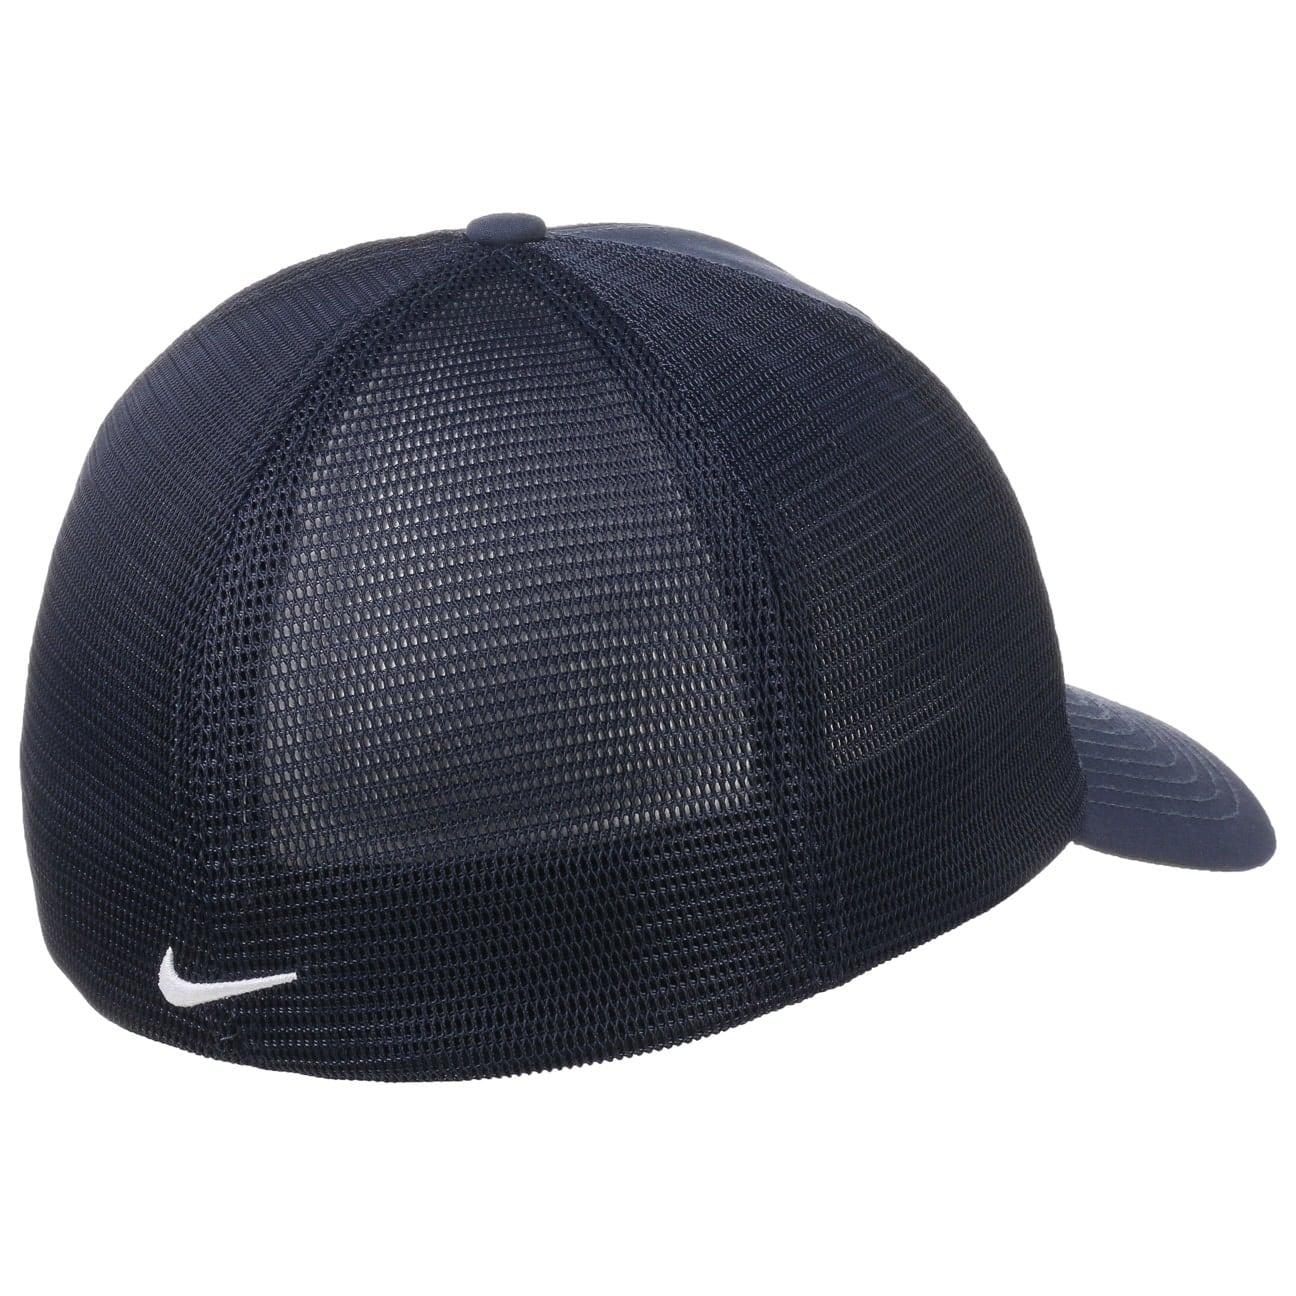 buy popular 6290c c711c ... inexpensive legacy91 uni flexfit mesh cap by nike 4 fac34 3067a